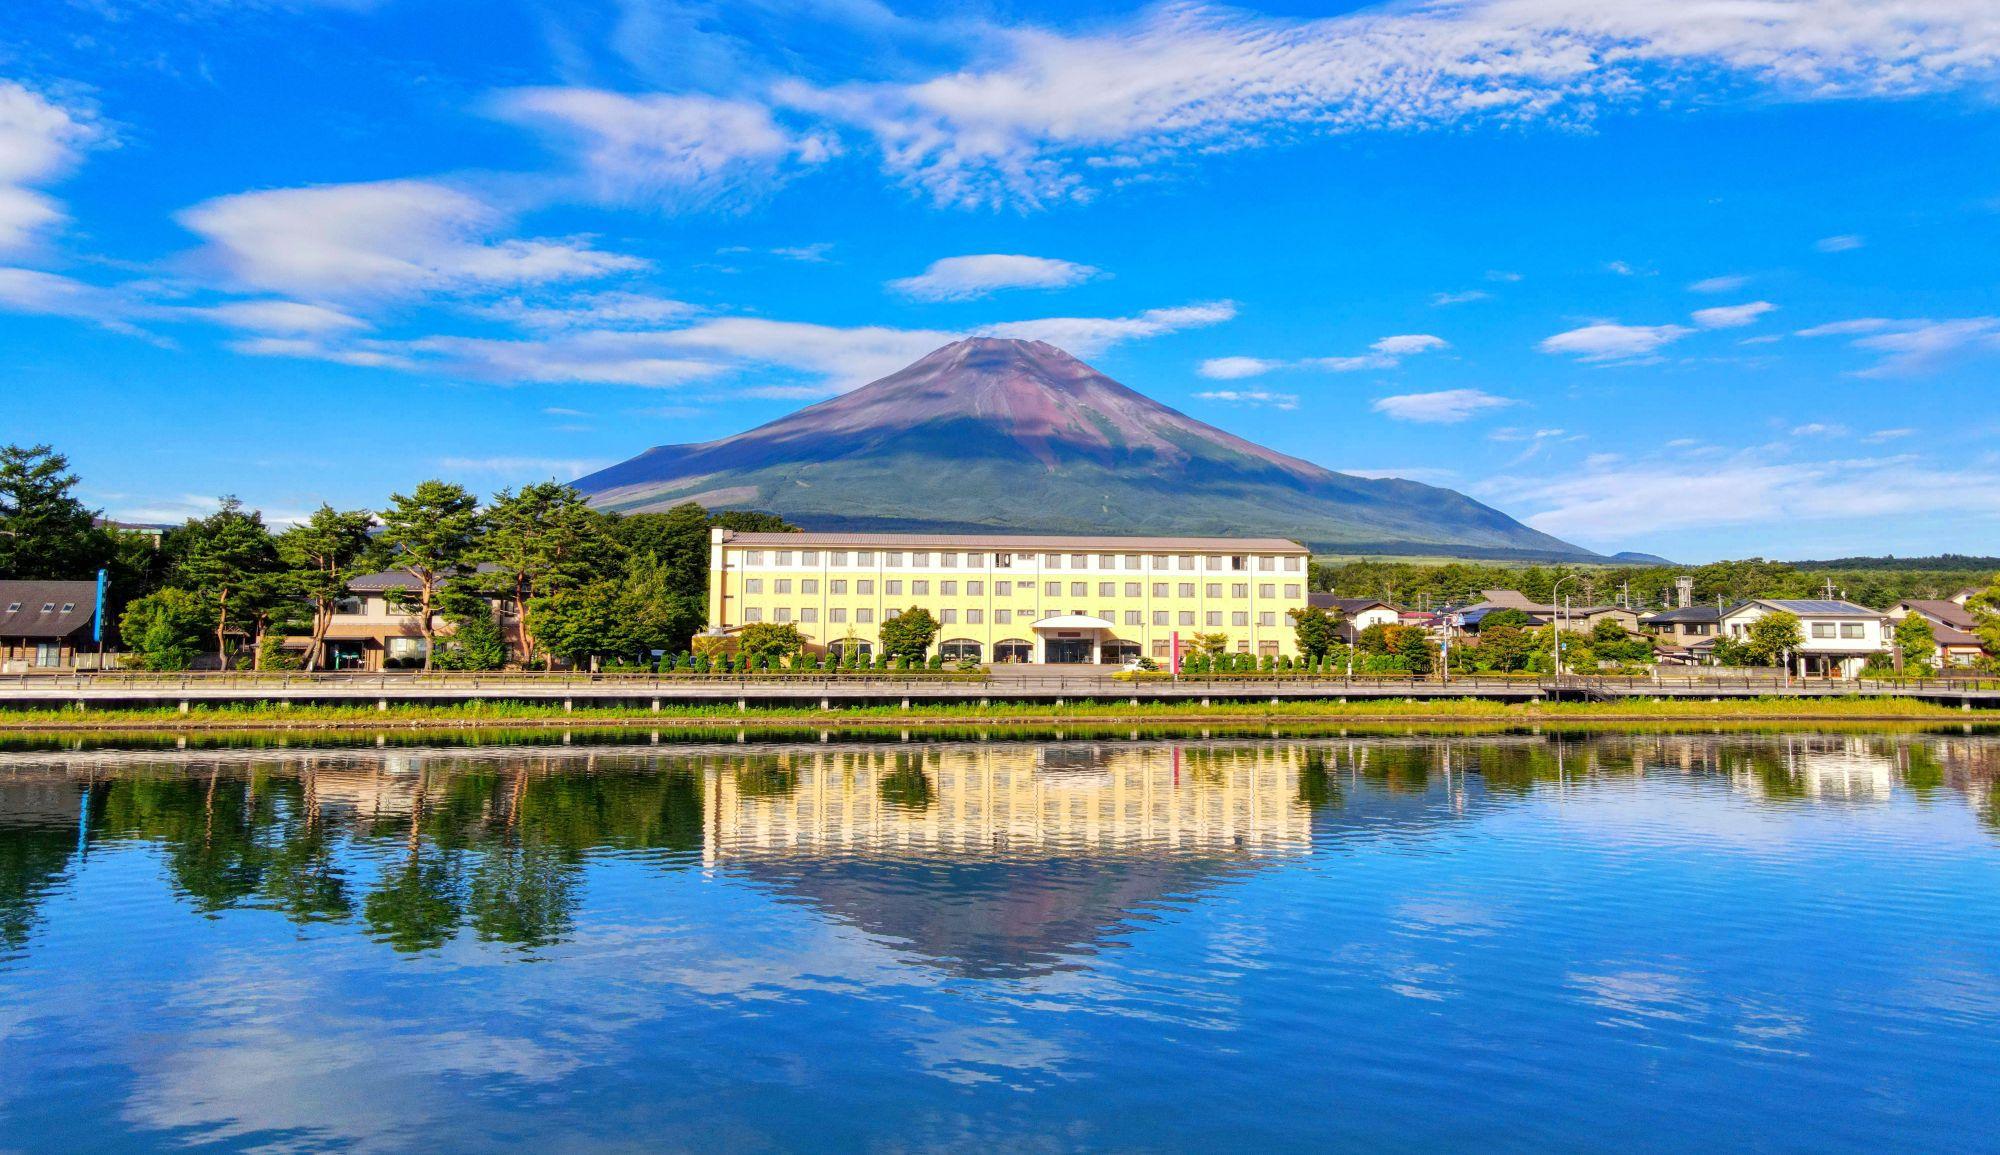 山中湖富士松温泉 富士松園ホテル image